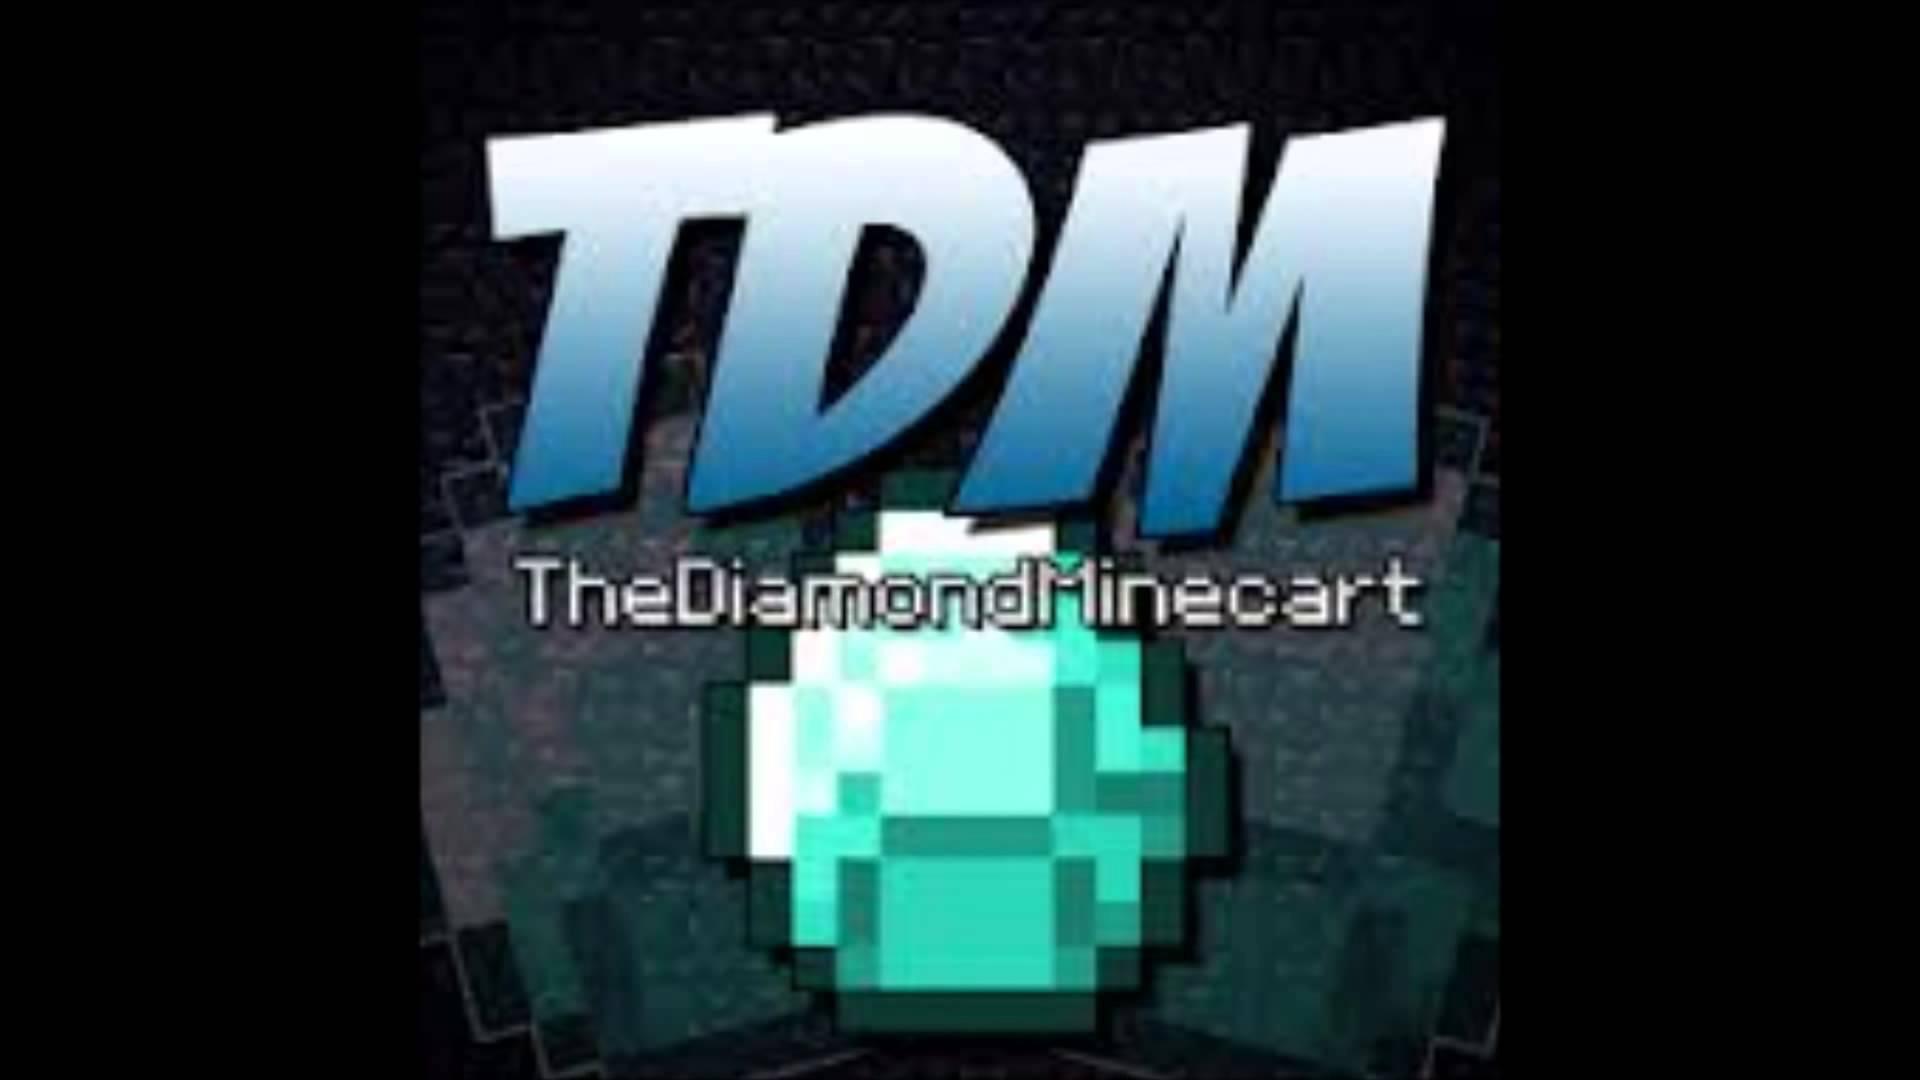 TheDiamondMinecart DANTDM intro song 1920x1080